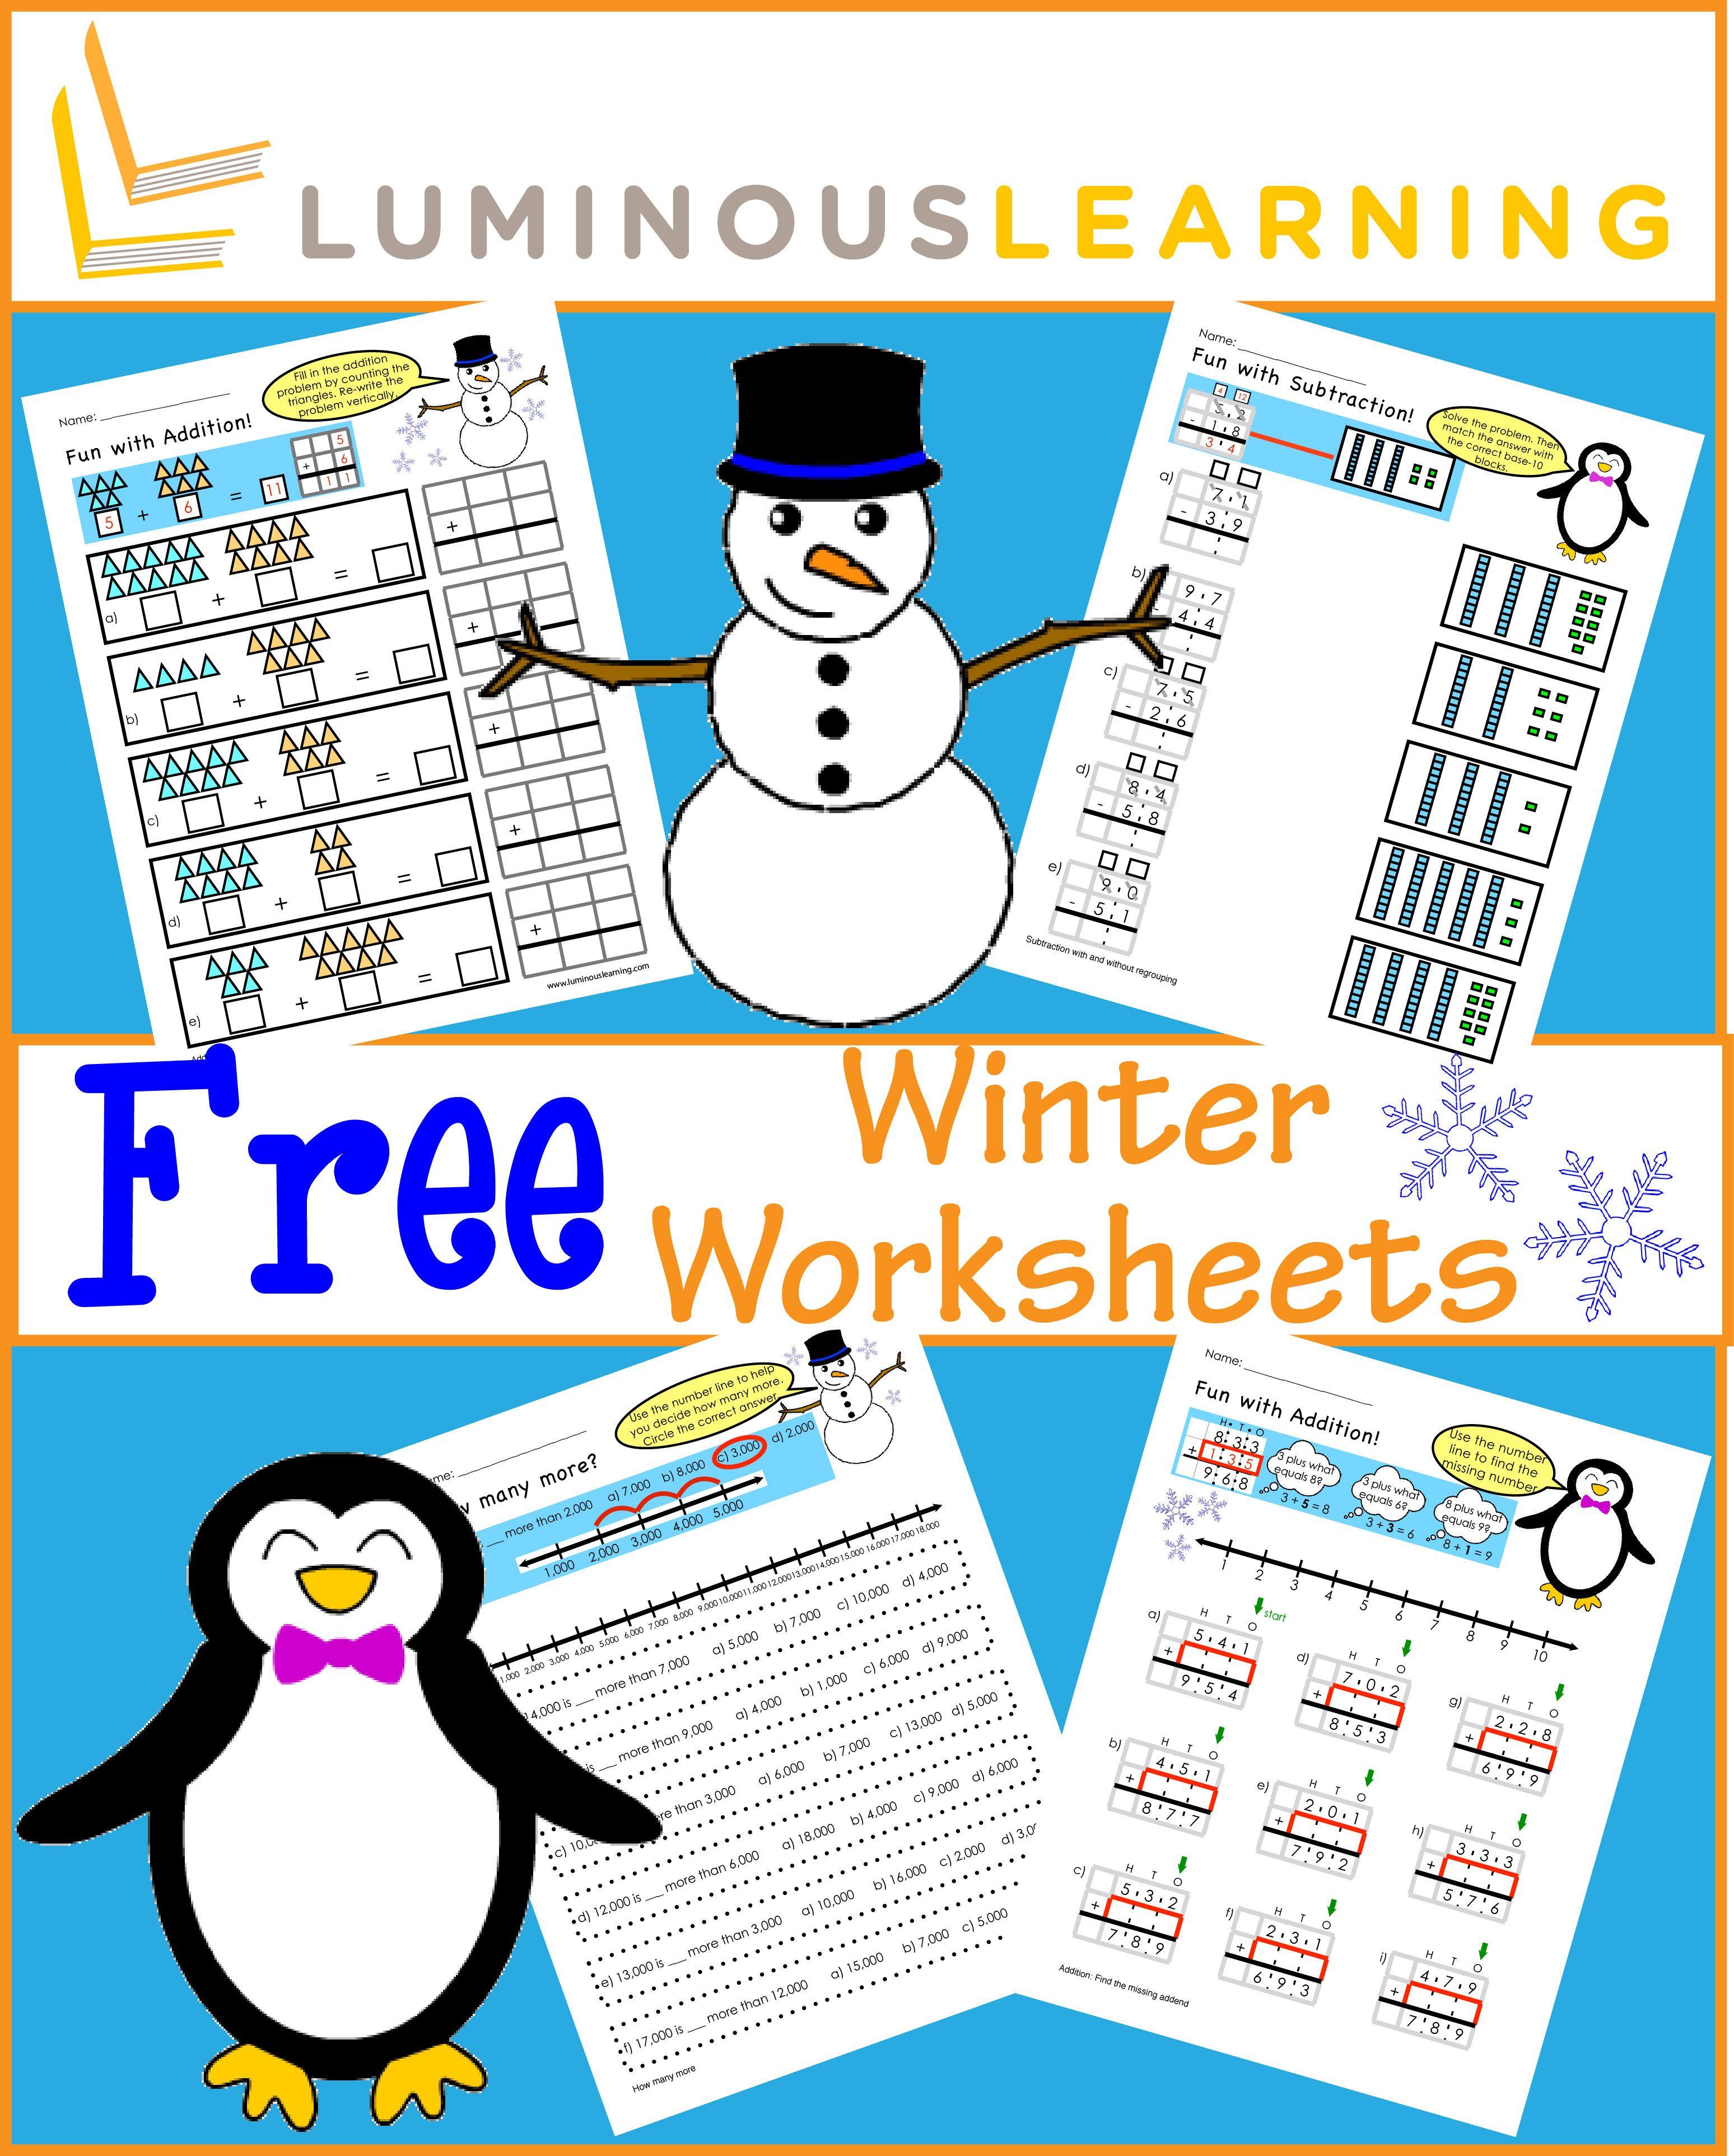 Free Math Worksheets Luminous Learning